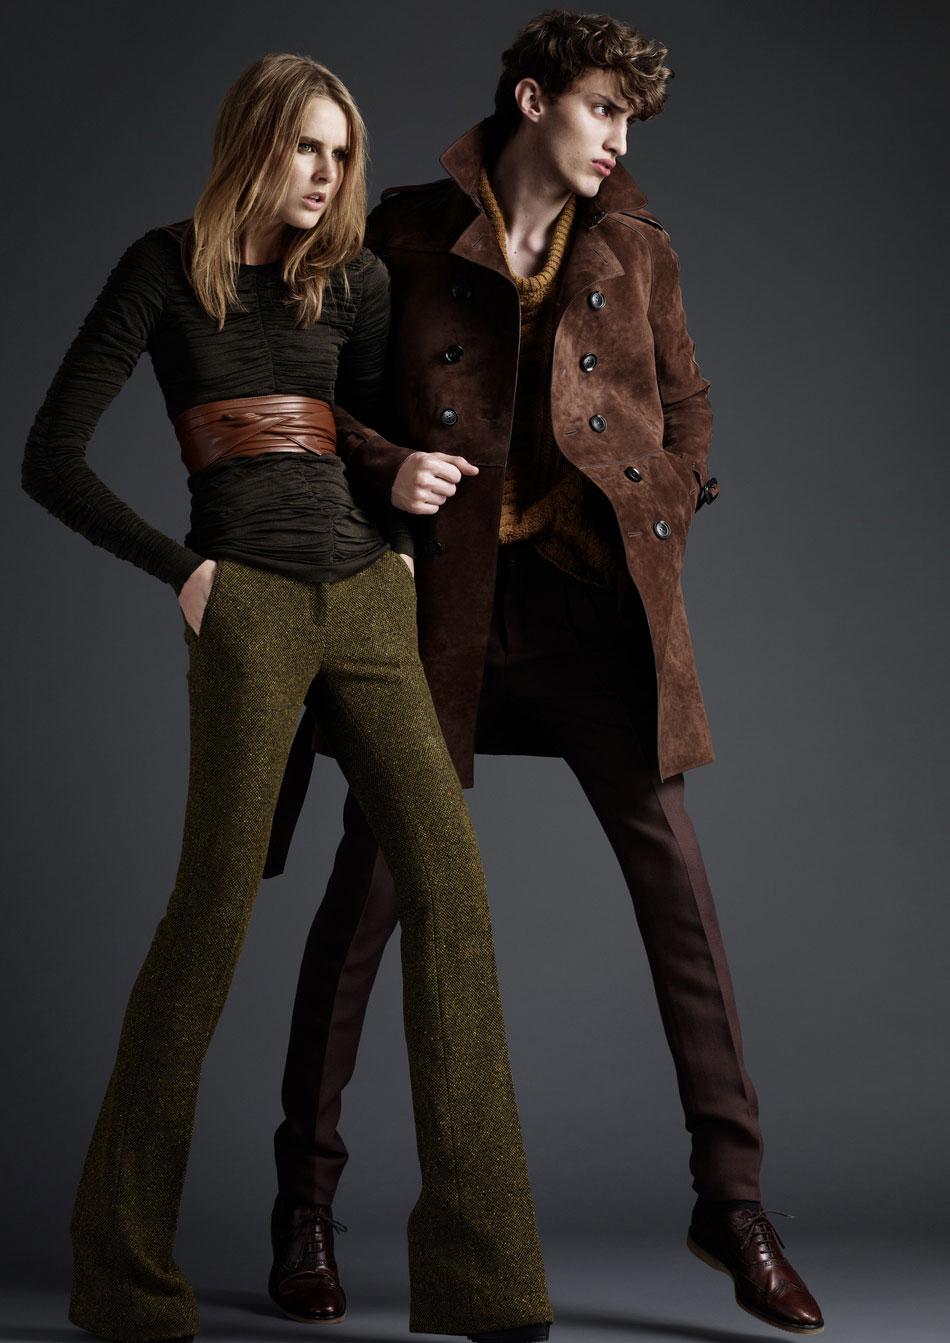 dandy bohemian: Burberry Prorsum Menswear Pre-Collection ...